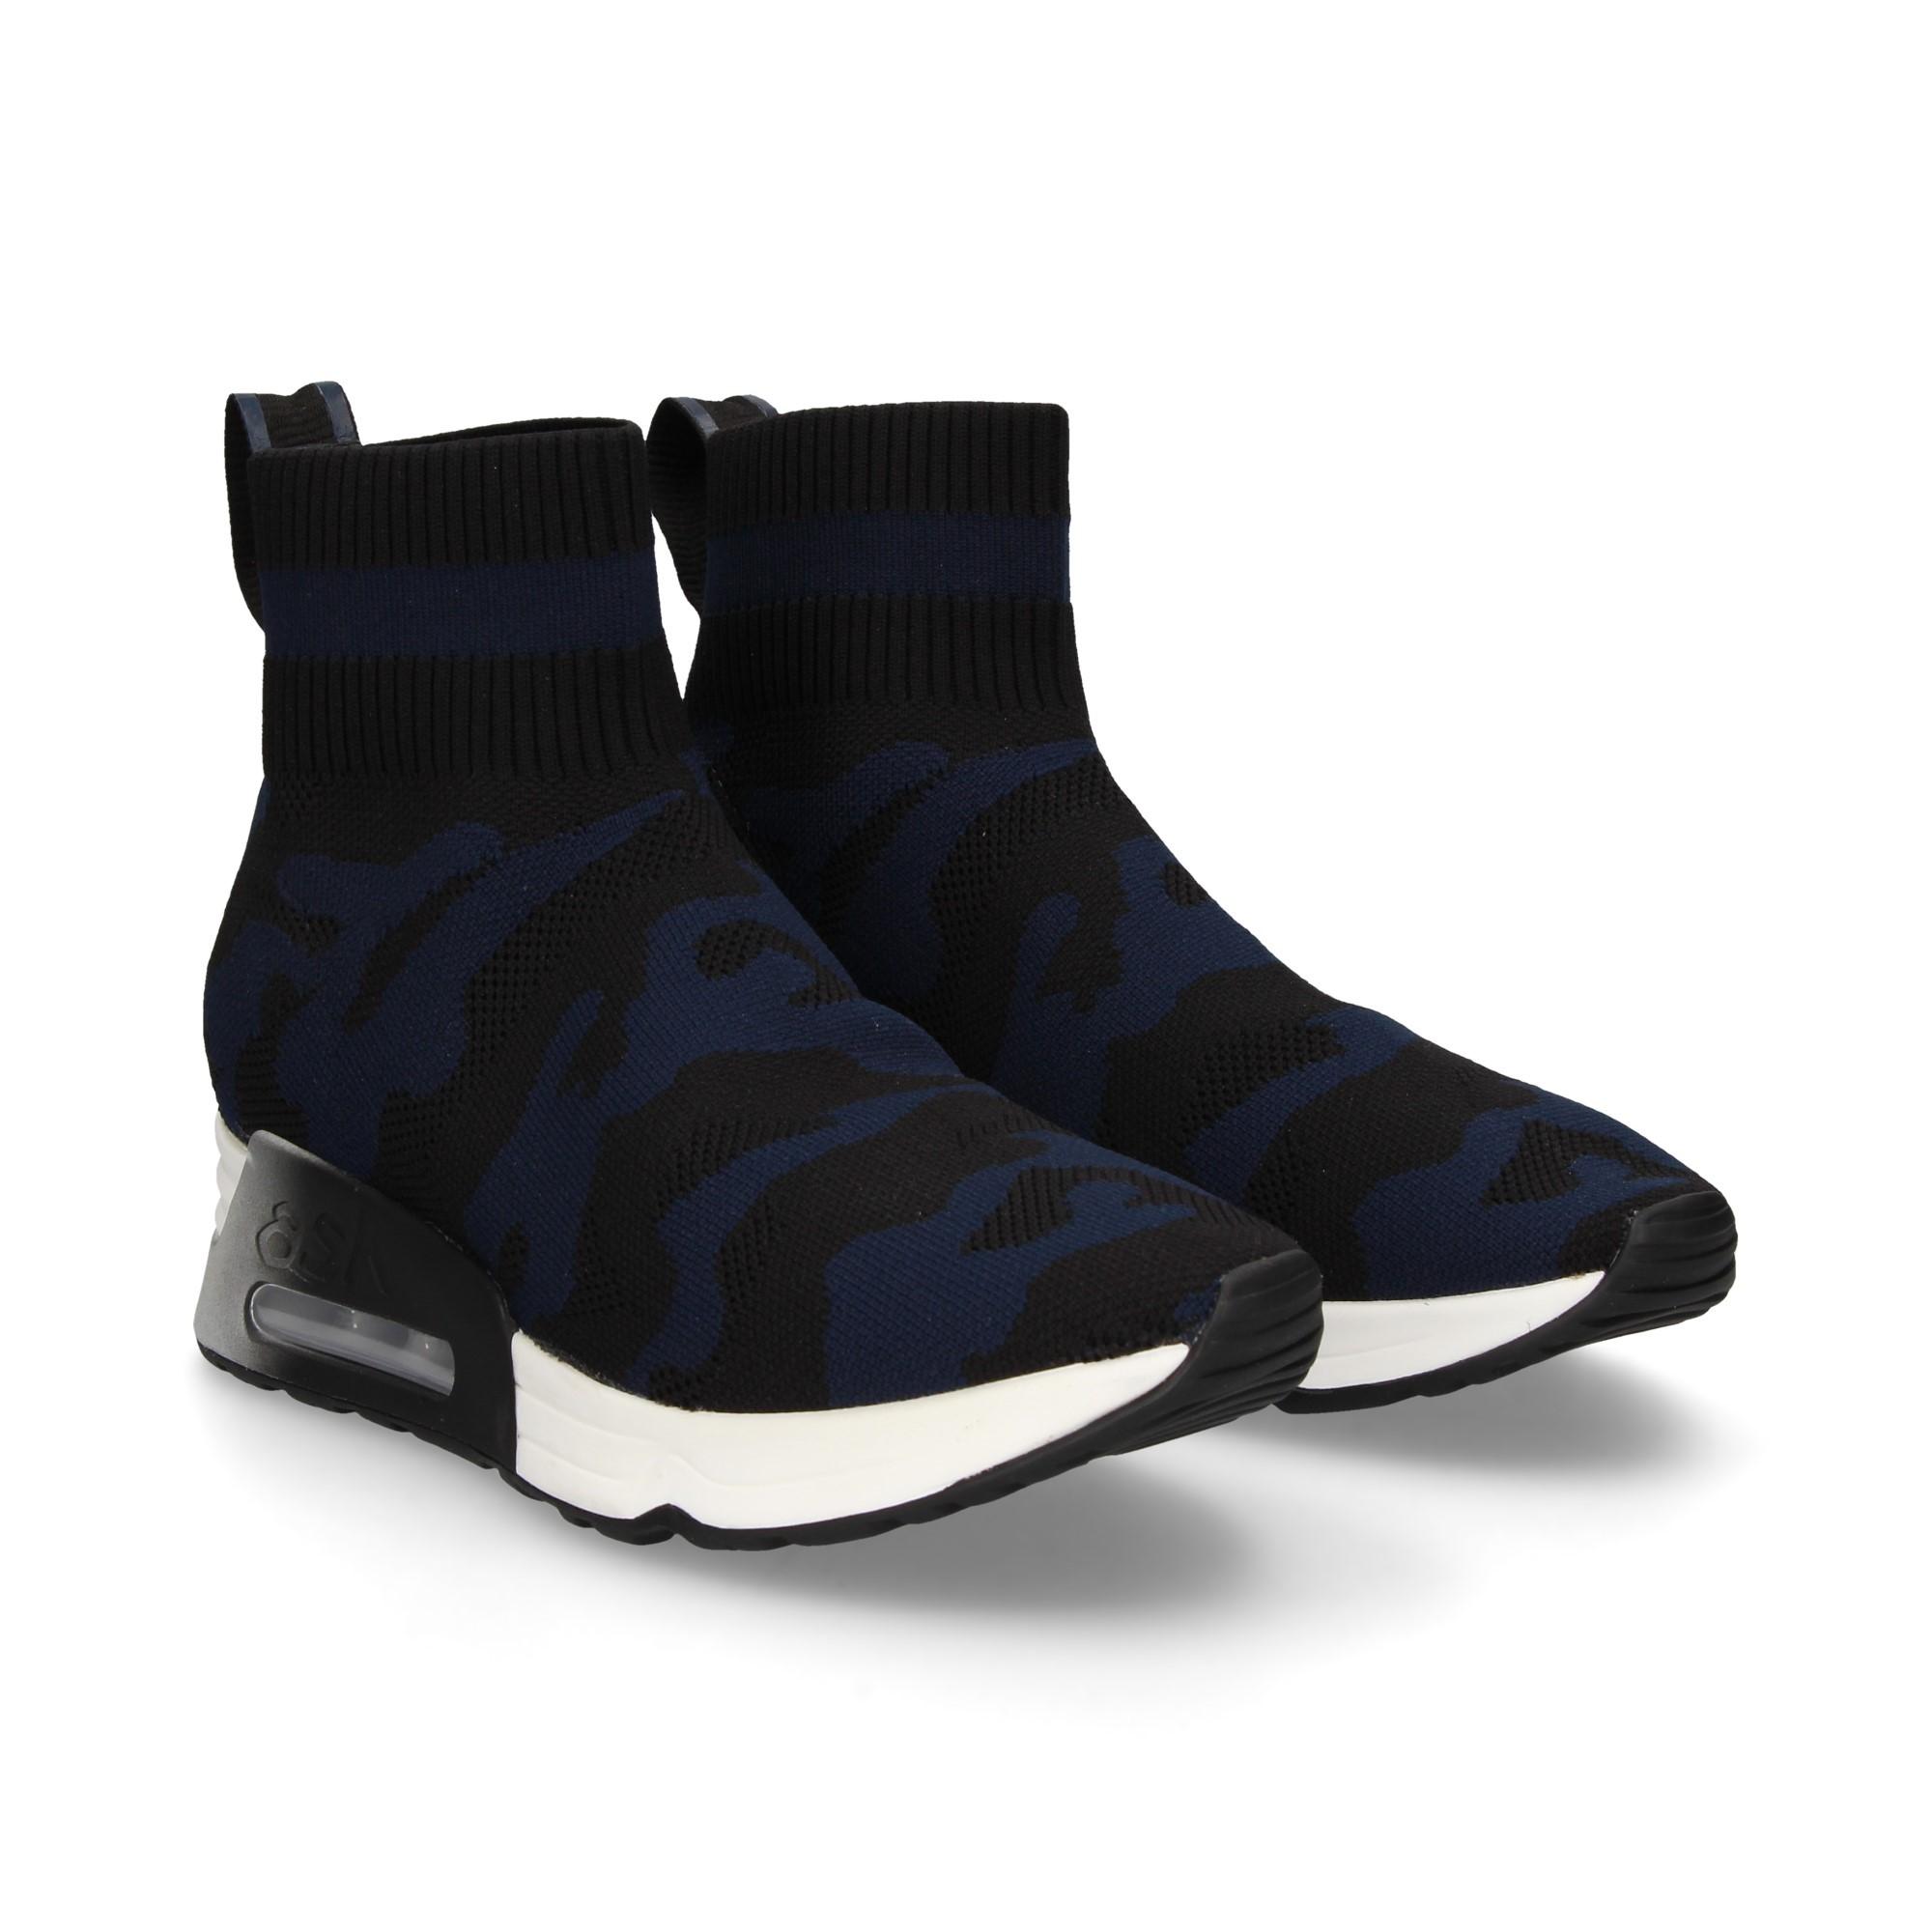 botin-deportivo-calcetin-camuf-negro-mar